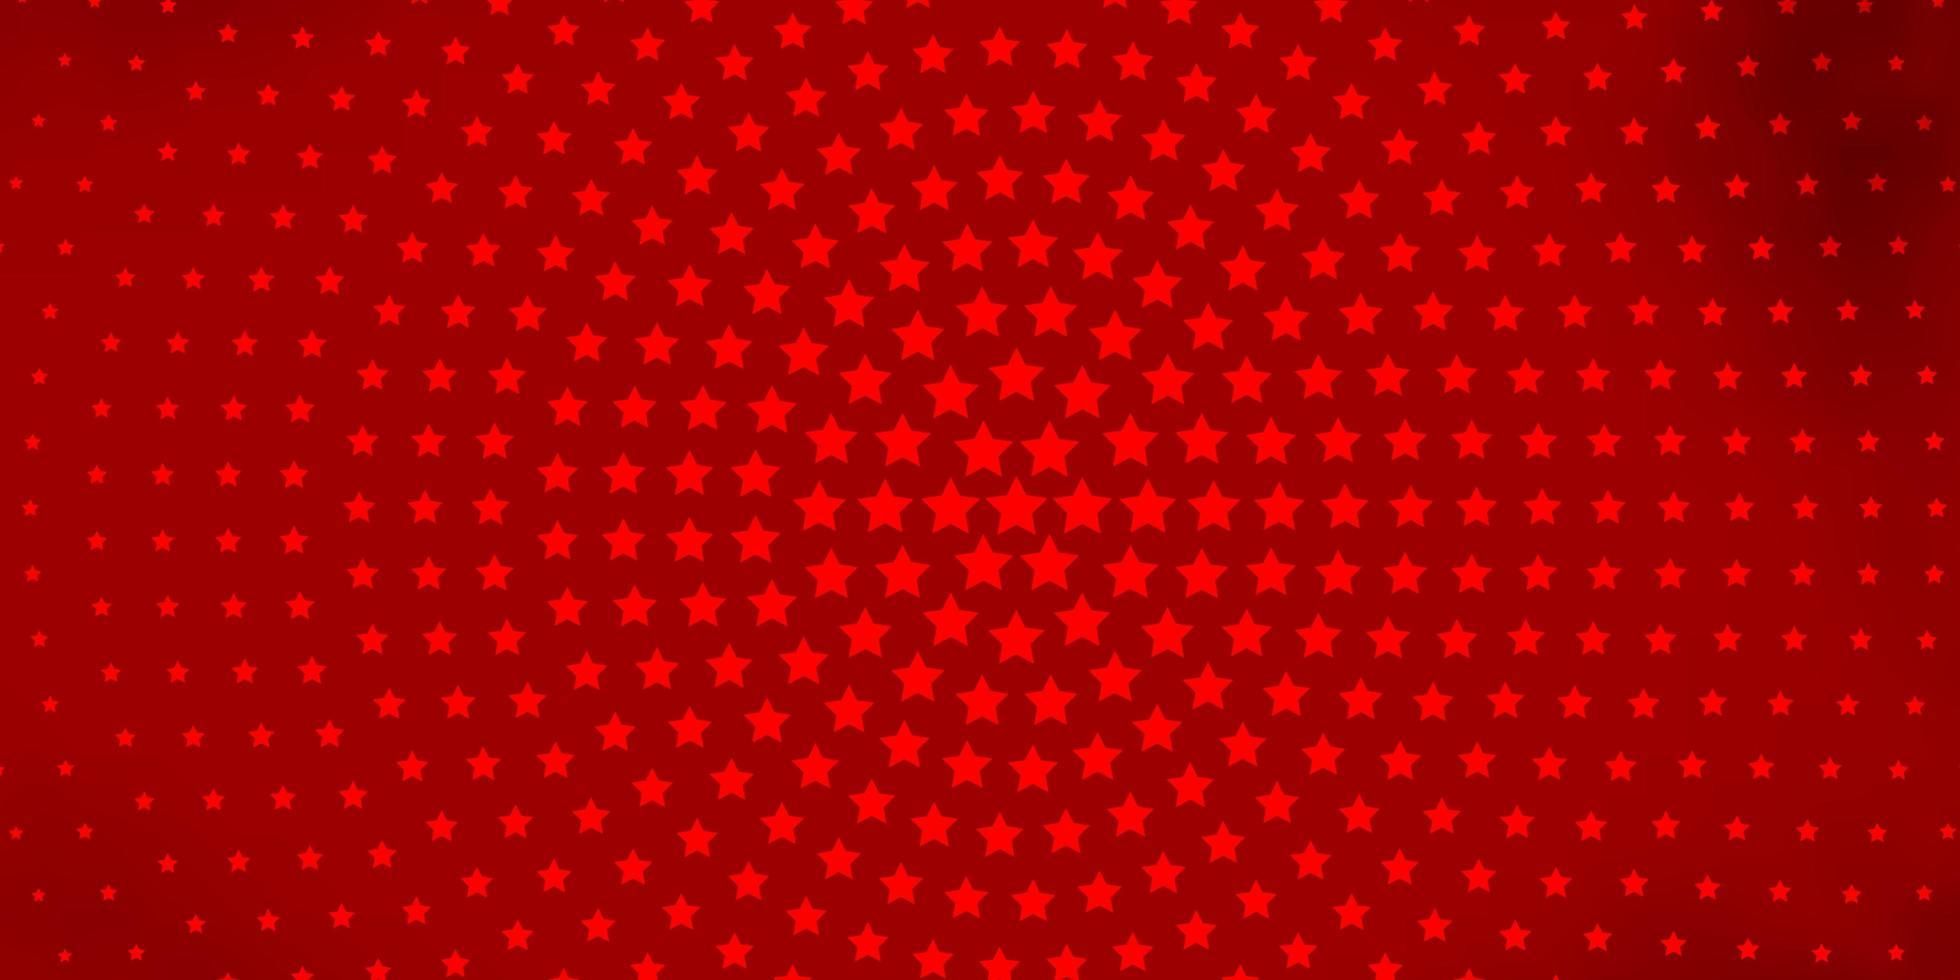 Patrón de vector naranja oscuro con estrellas abstractas.